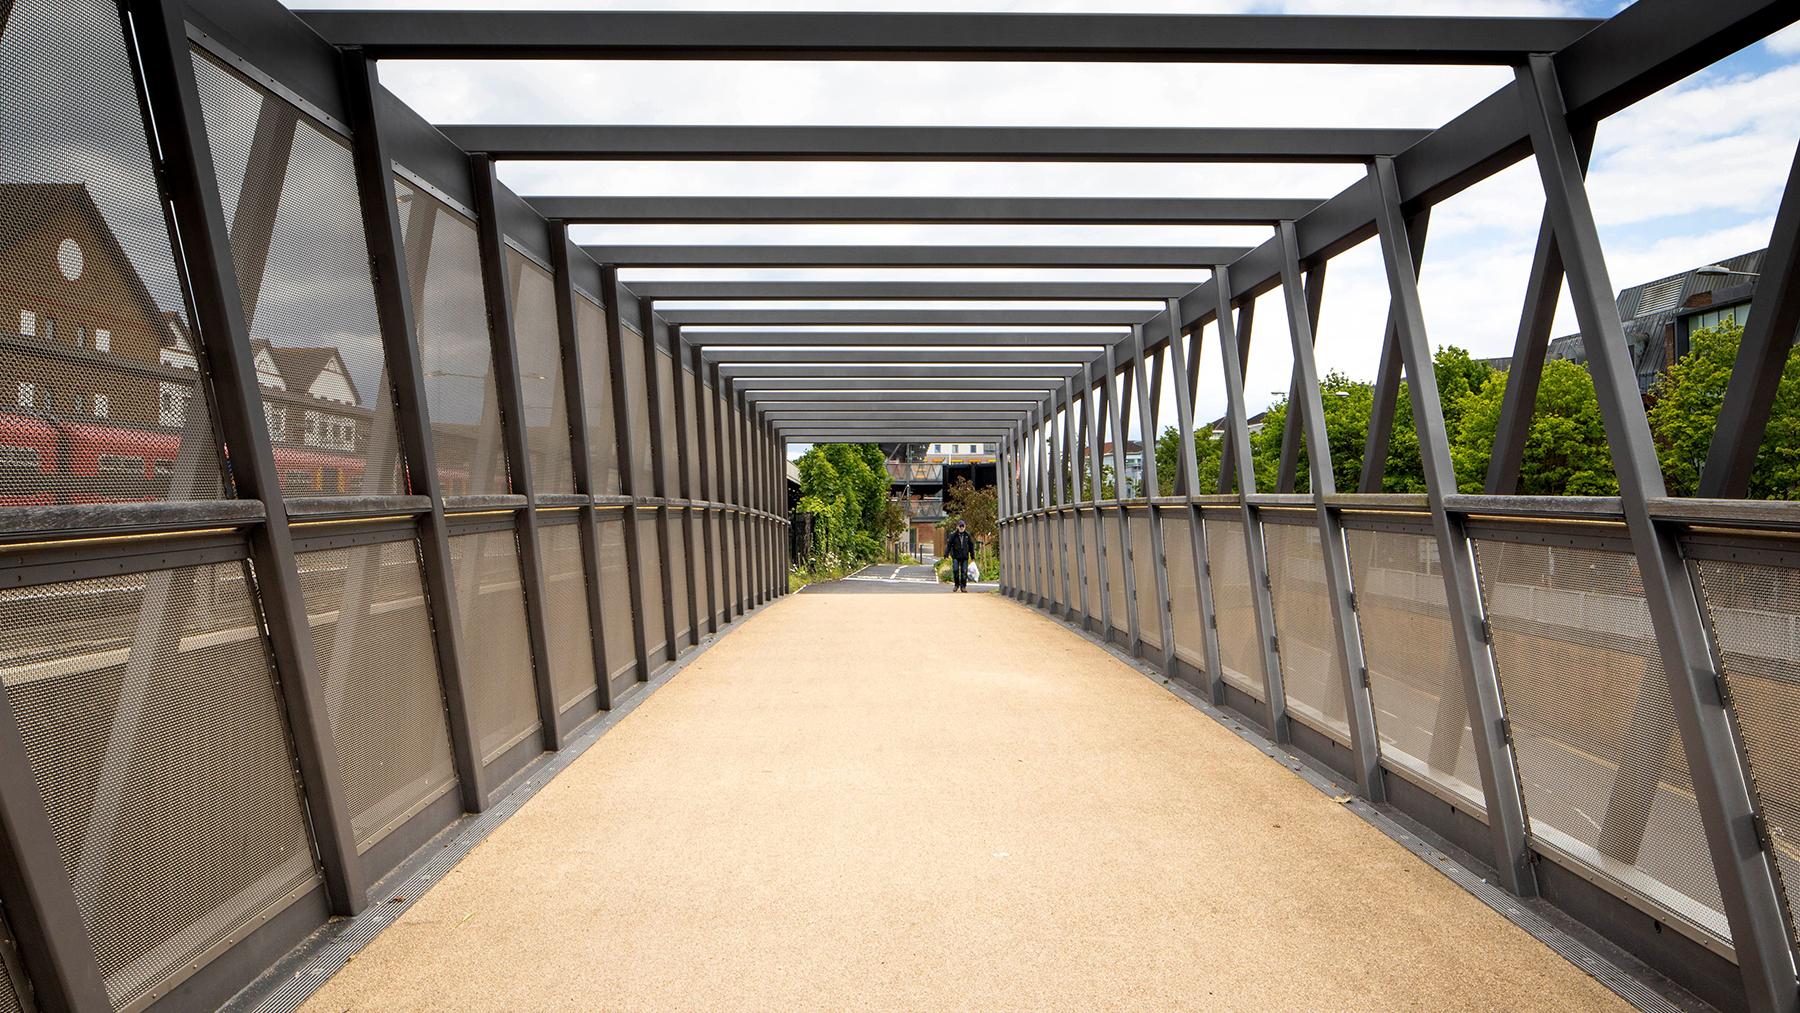 Sarah-Wigglesworth-Architects Kingston-Go-Cycle Bridge Frames Hub 1800x1013